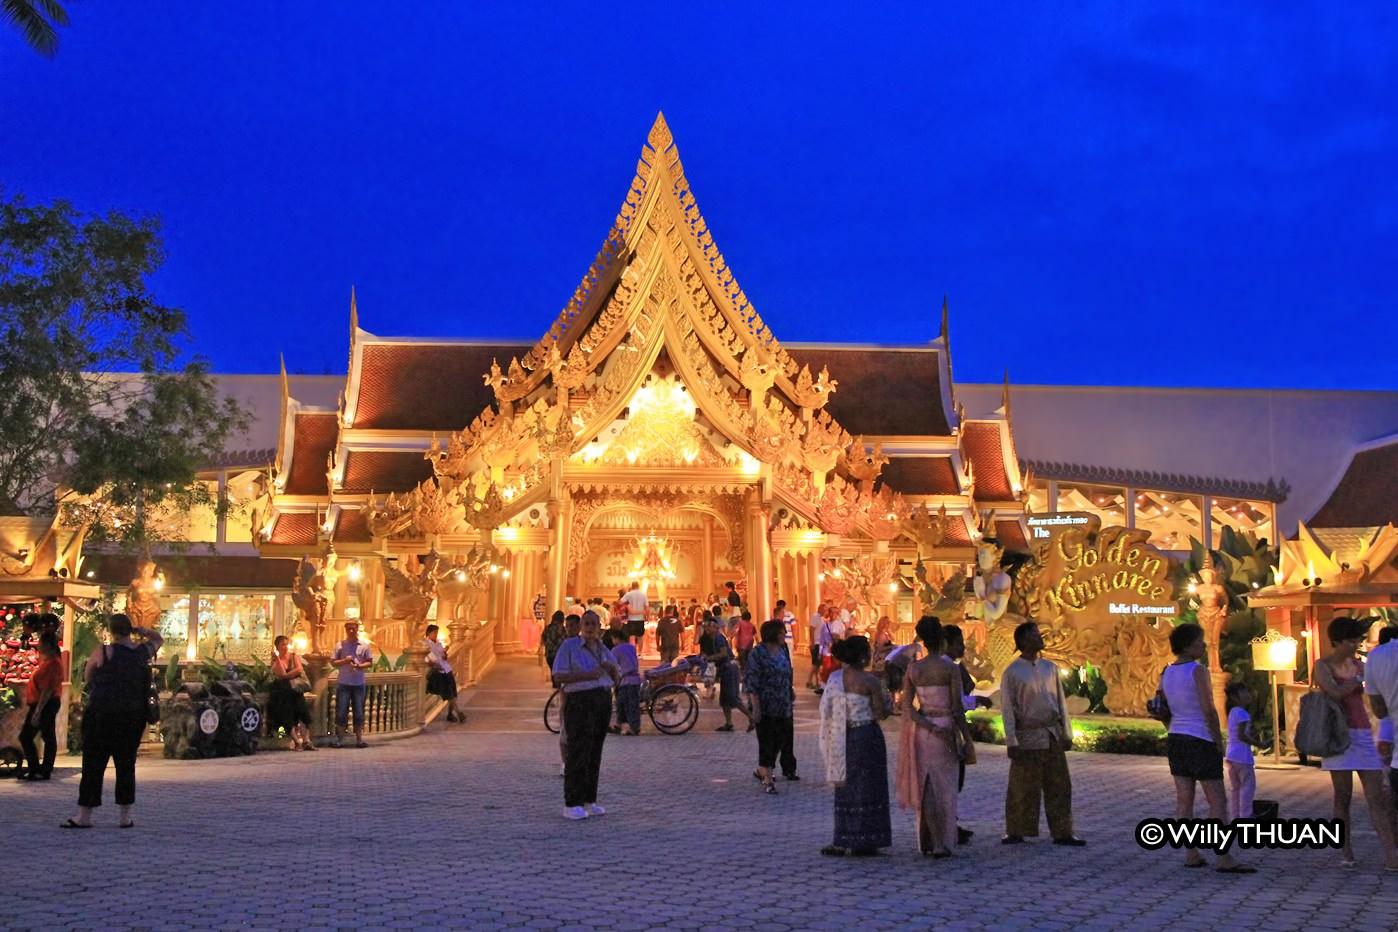 Phuket Fantasea Show in Kamala Beach - Phuket 101